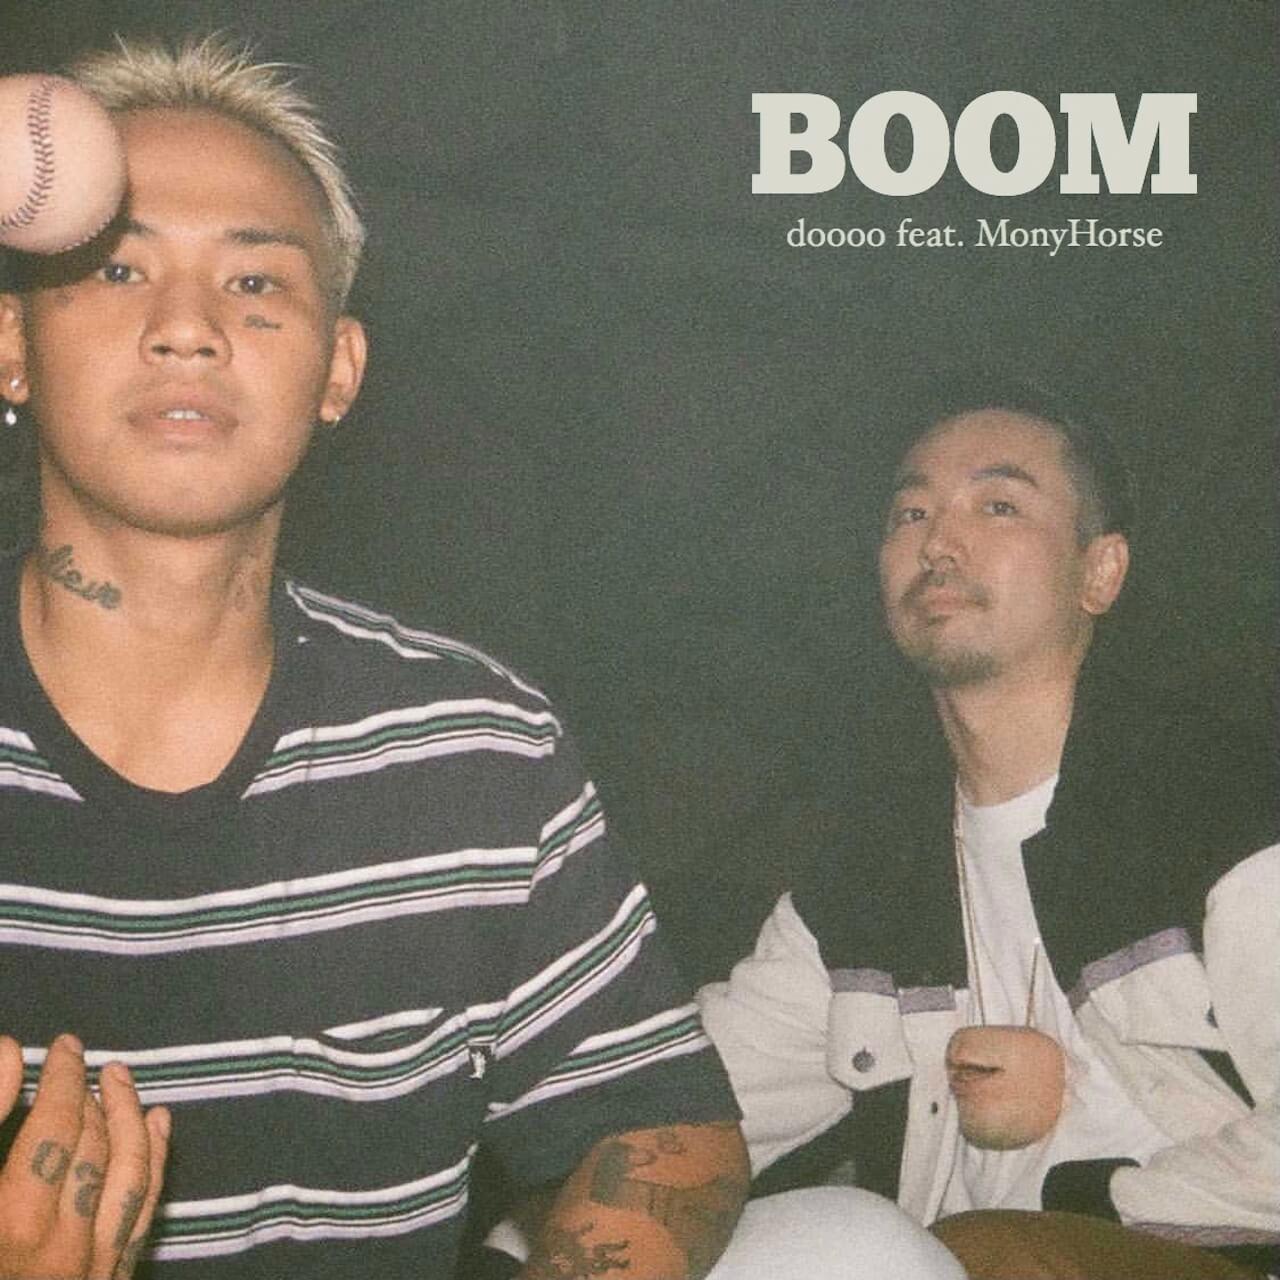 doooo、MonyHorseを迎えた新曲「BOOM」をリリース IKが監督したMV公開 music210922-doooo-1